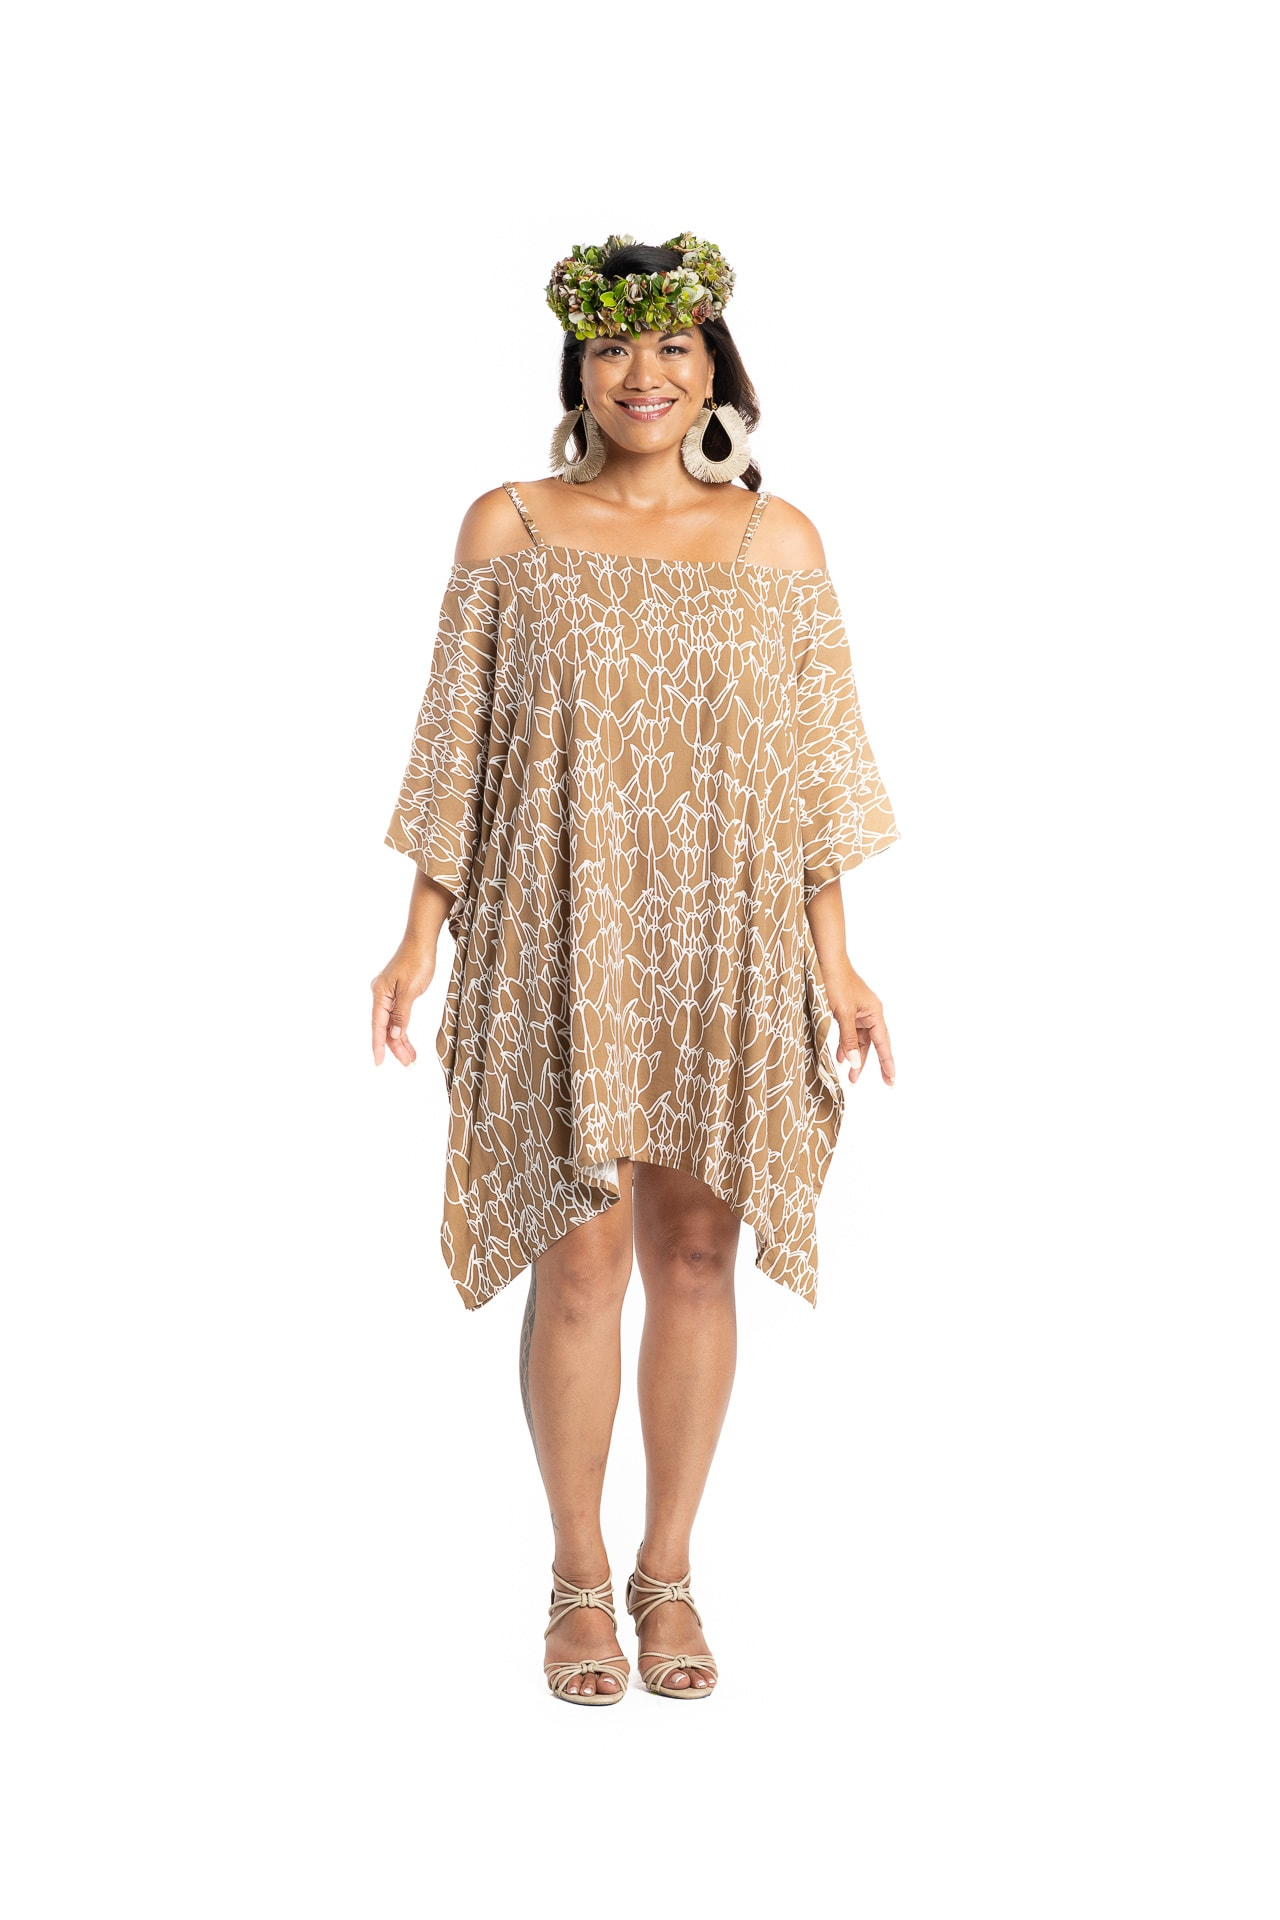 Model wearing Malama Top - Front View